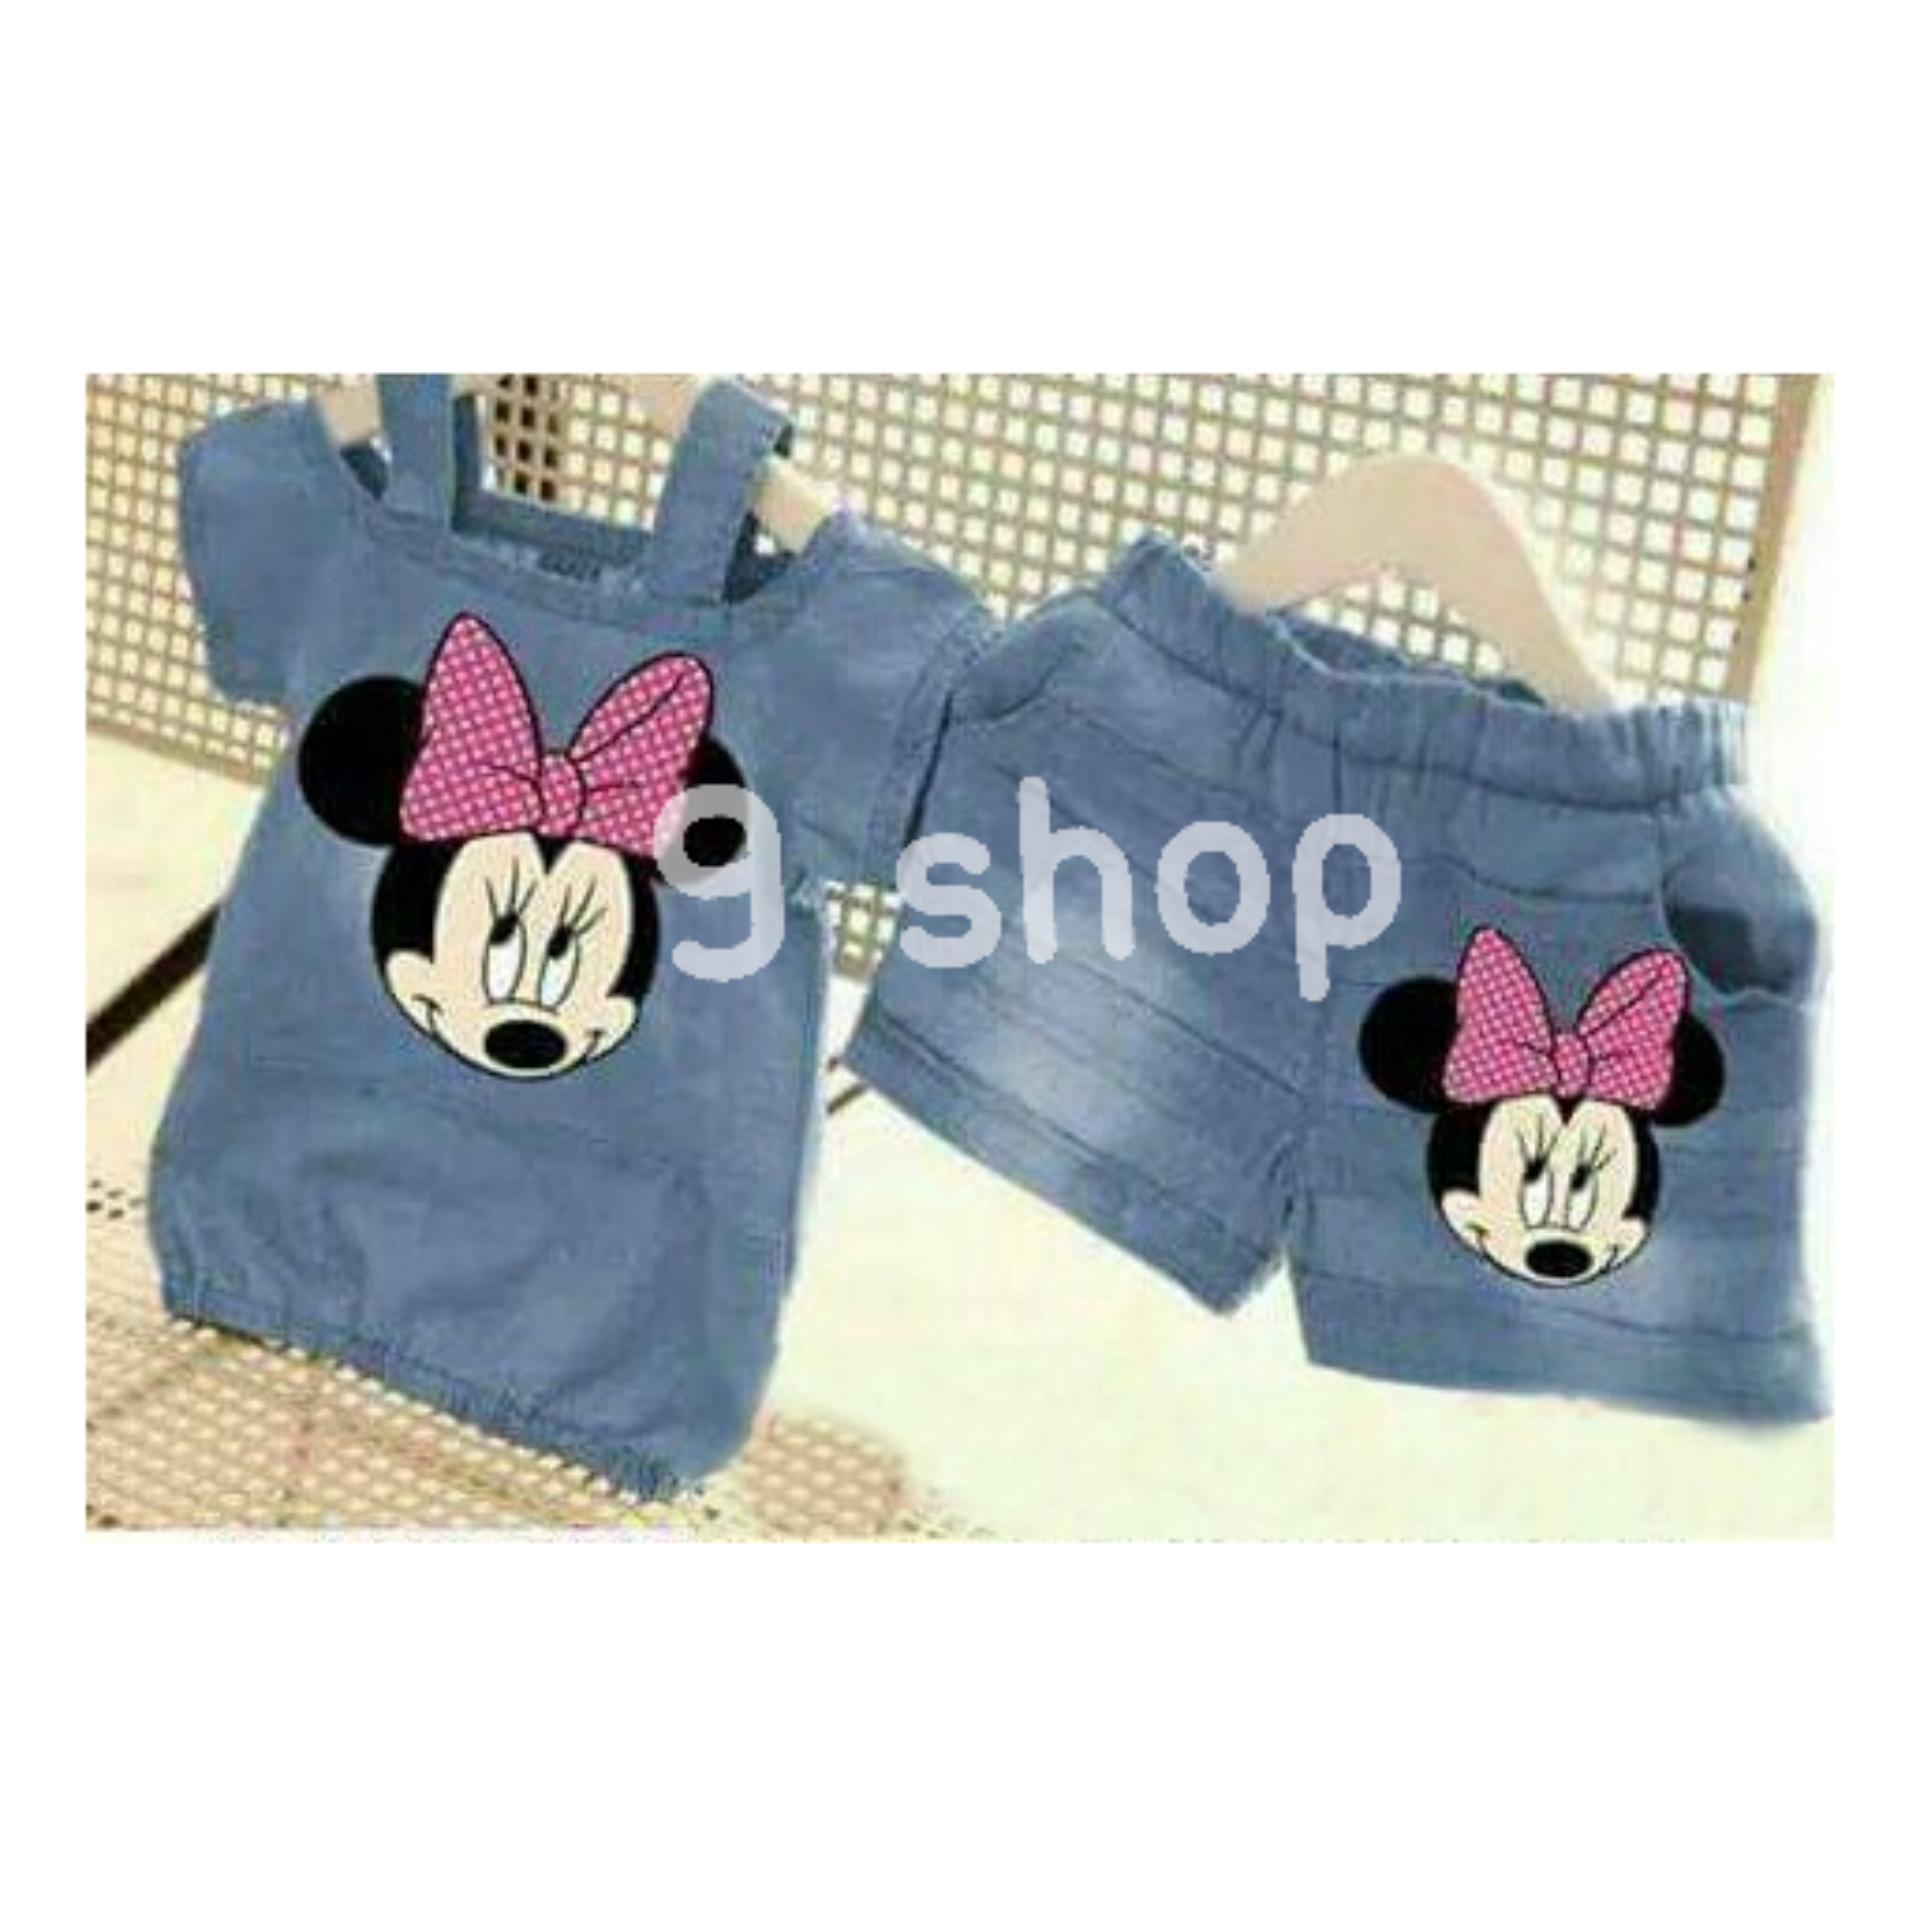 9 Shop Setelan Baju dan Celana Anak Perempuan MINI MOOSE/ Stelan Baju Anak Perempuan / Stelan Anak Cewek / Baju Anak Perempuan / Celana Anak Perempuan / Setelan Anak Cewek / Setelan Anak Murah / Baju Anak Murah / Stelan Kartun Anak